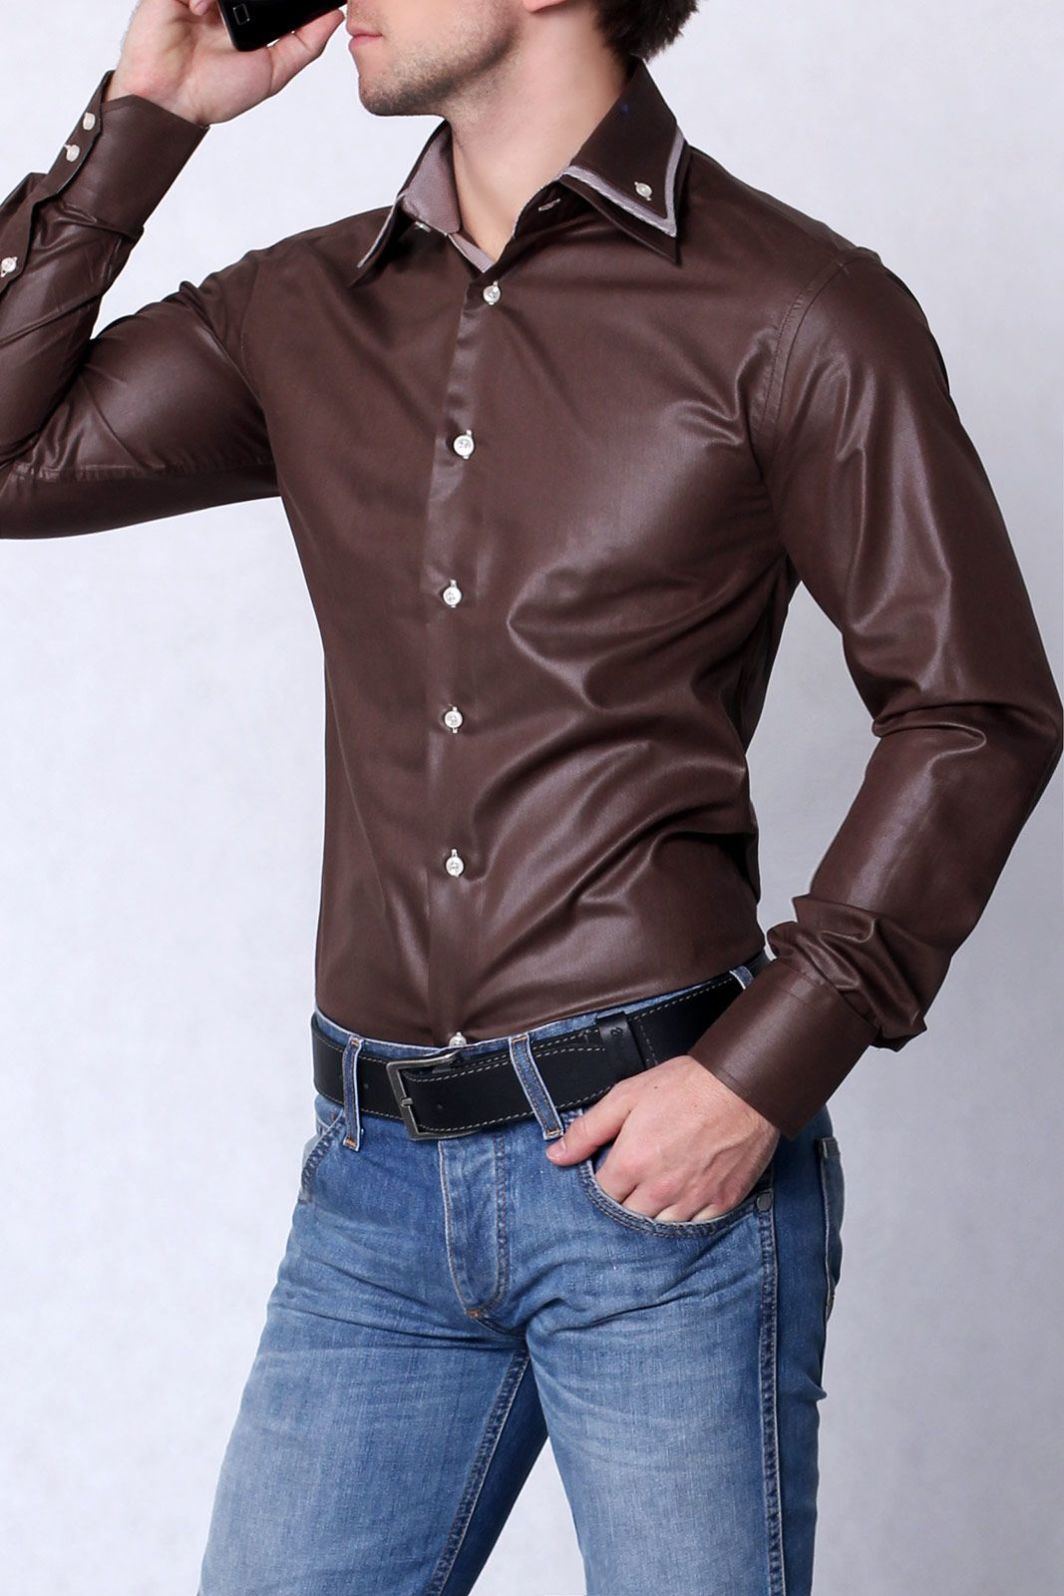 HIGHNESS Koszula męska slim fit połysk brązowy L 3612 s